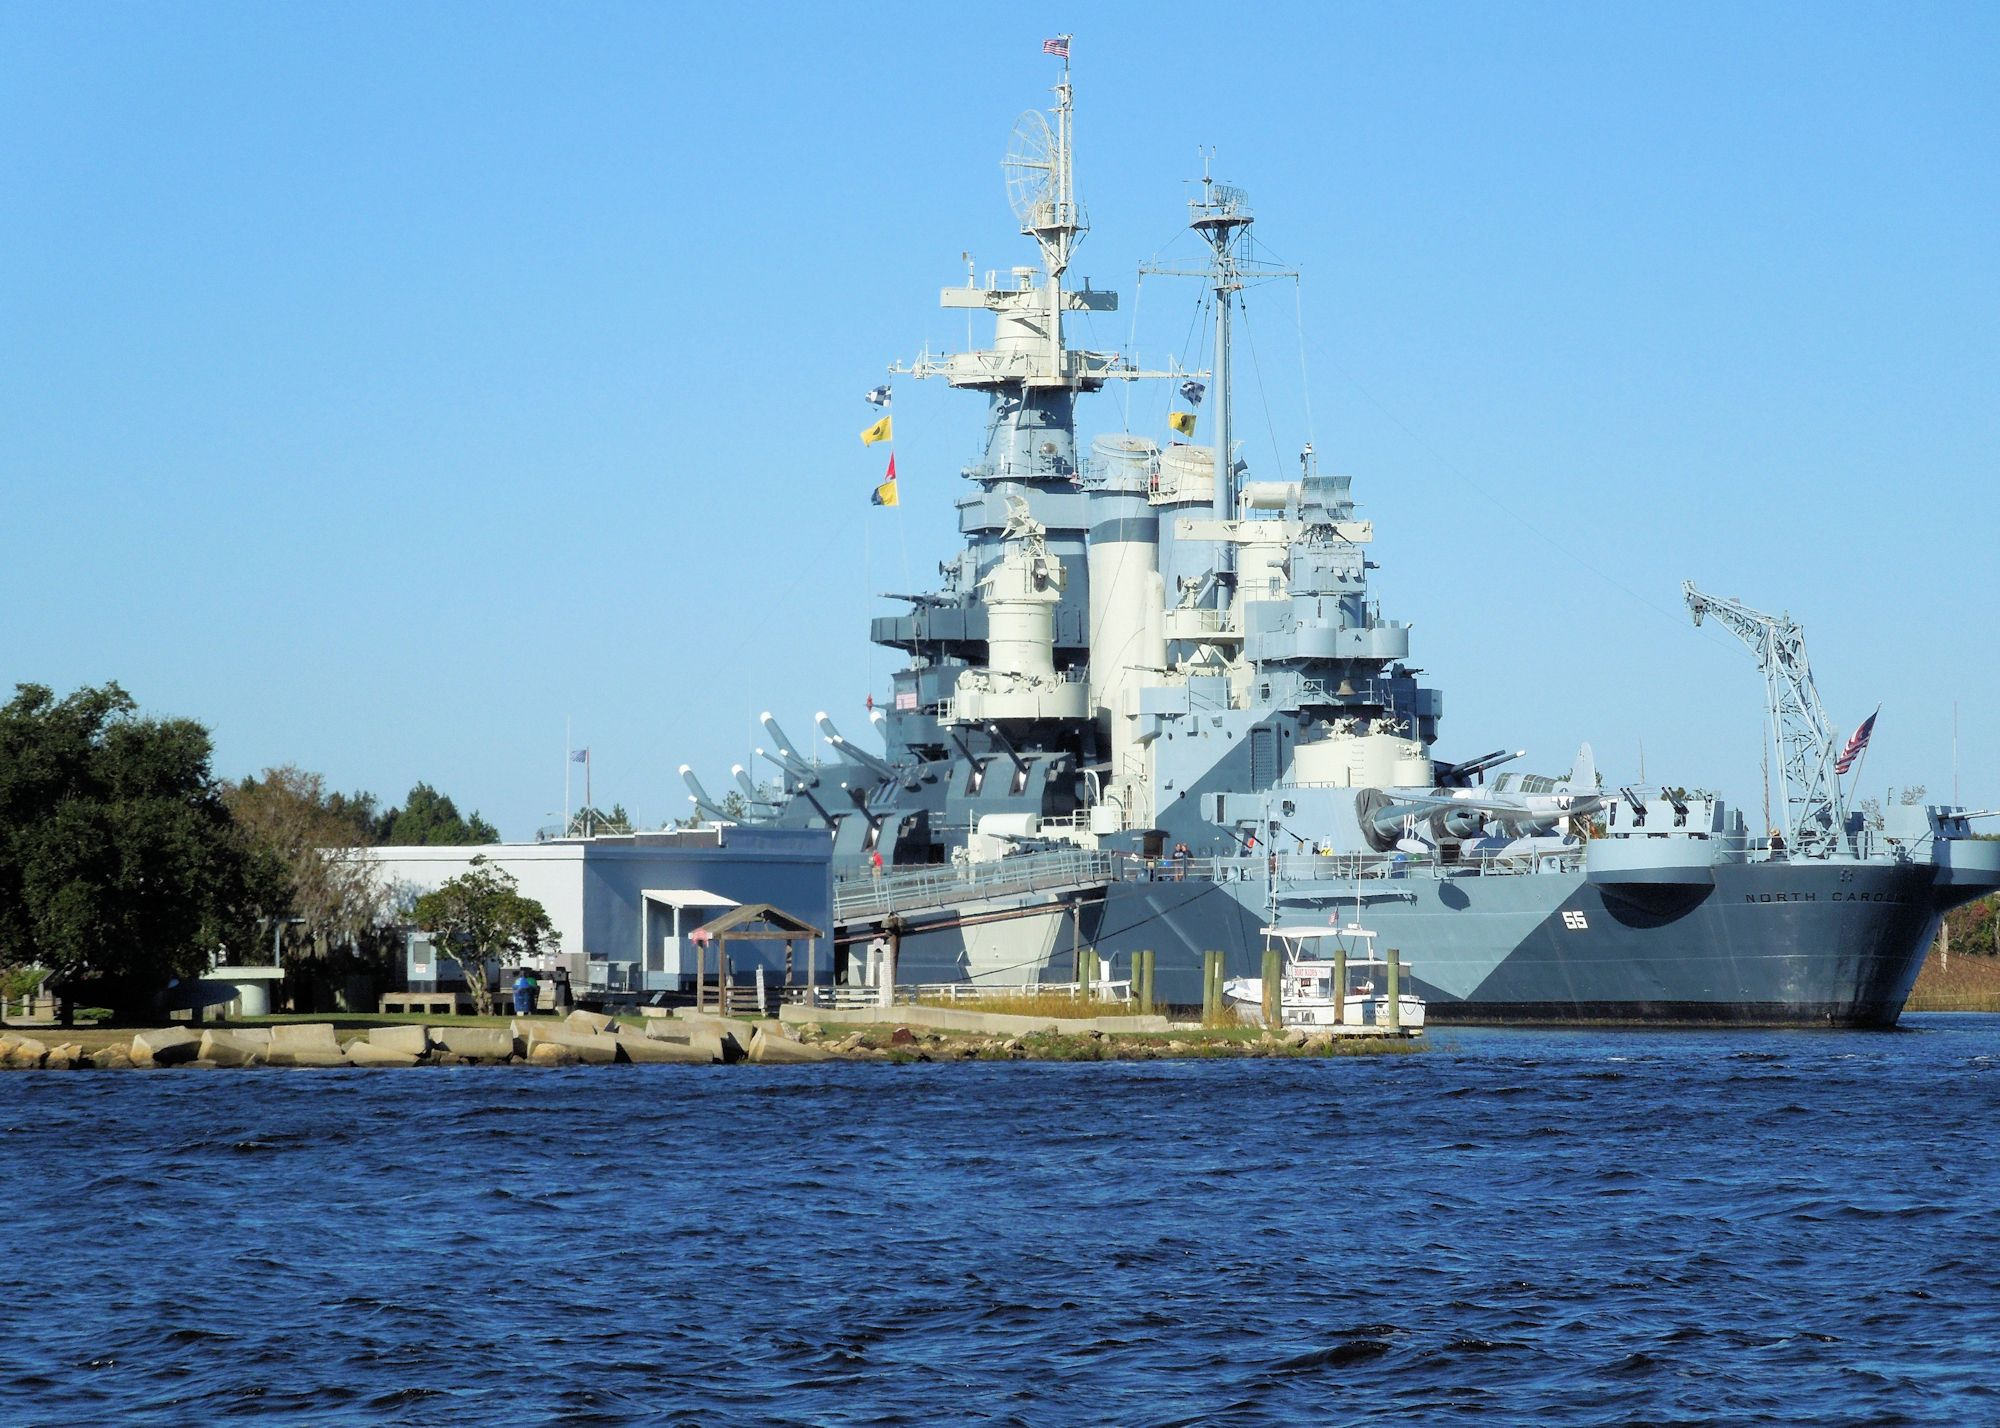 Downtown Wilmington - Battleship North Carolina